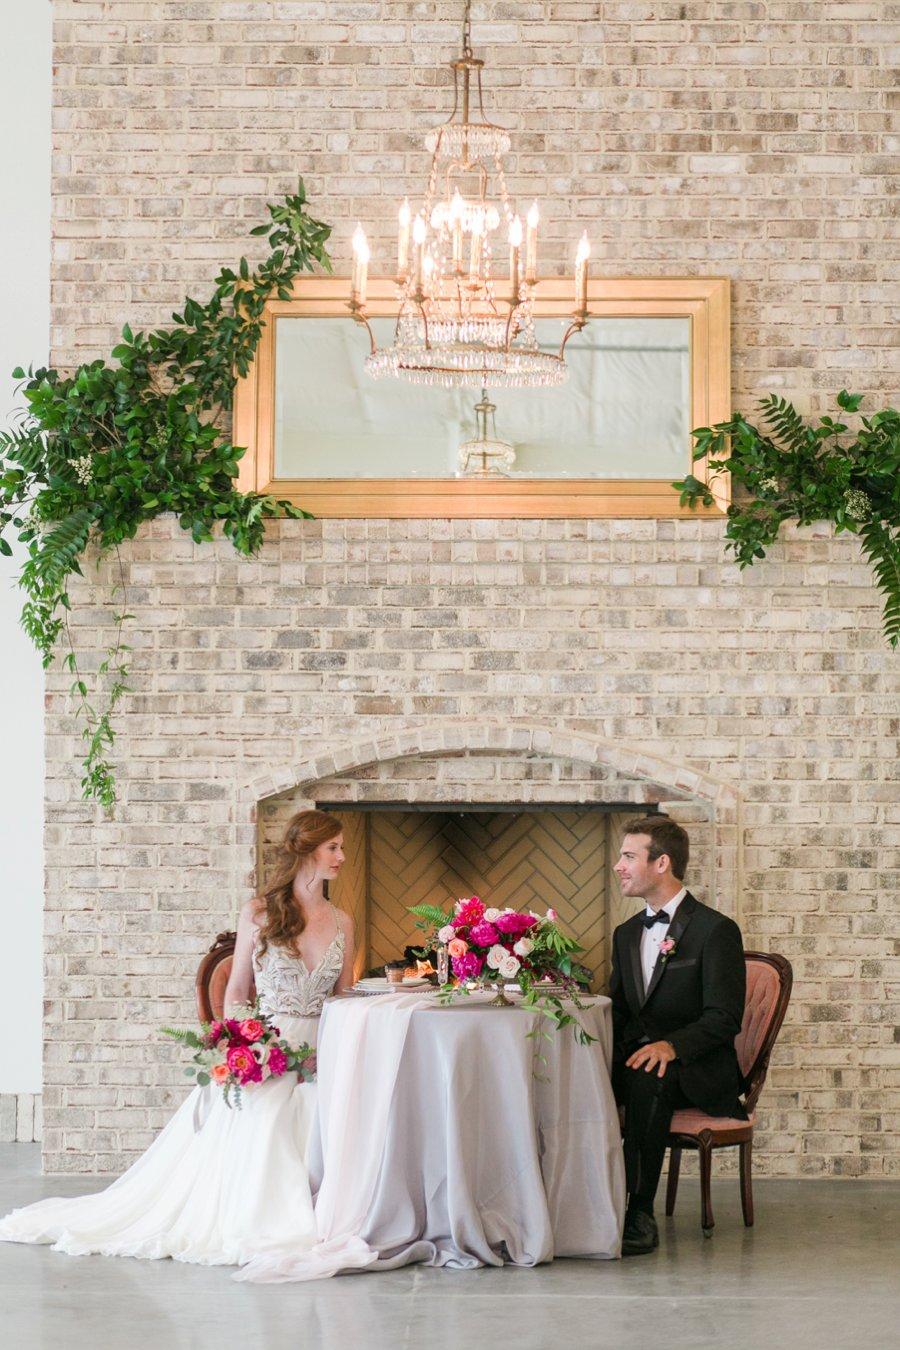 Pink Rustic Garden Inspired Wedding Ideas via TheELD.com